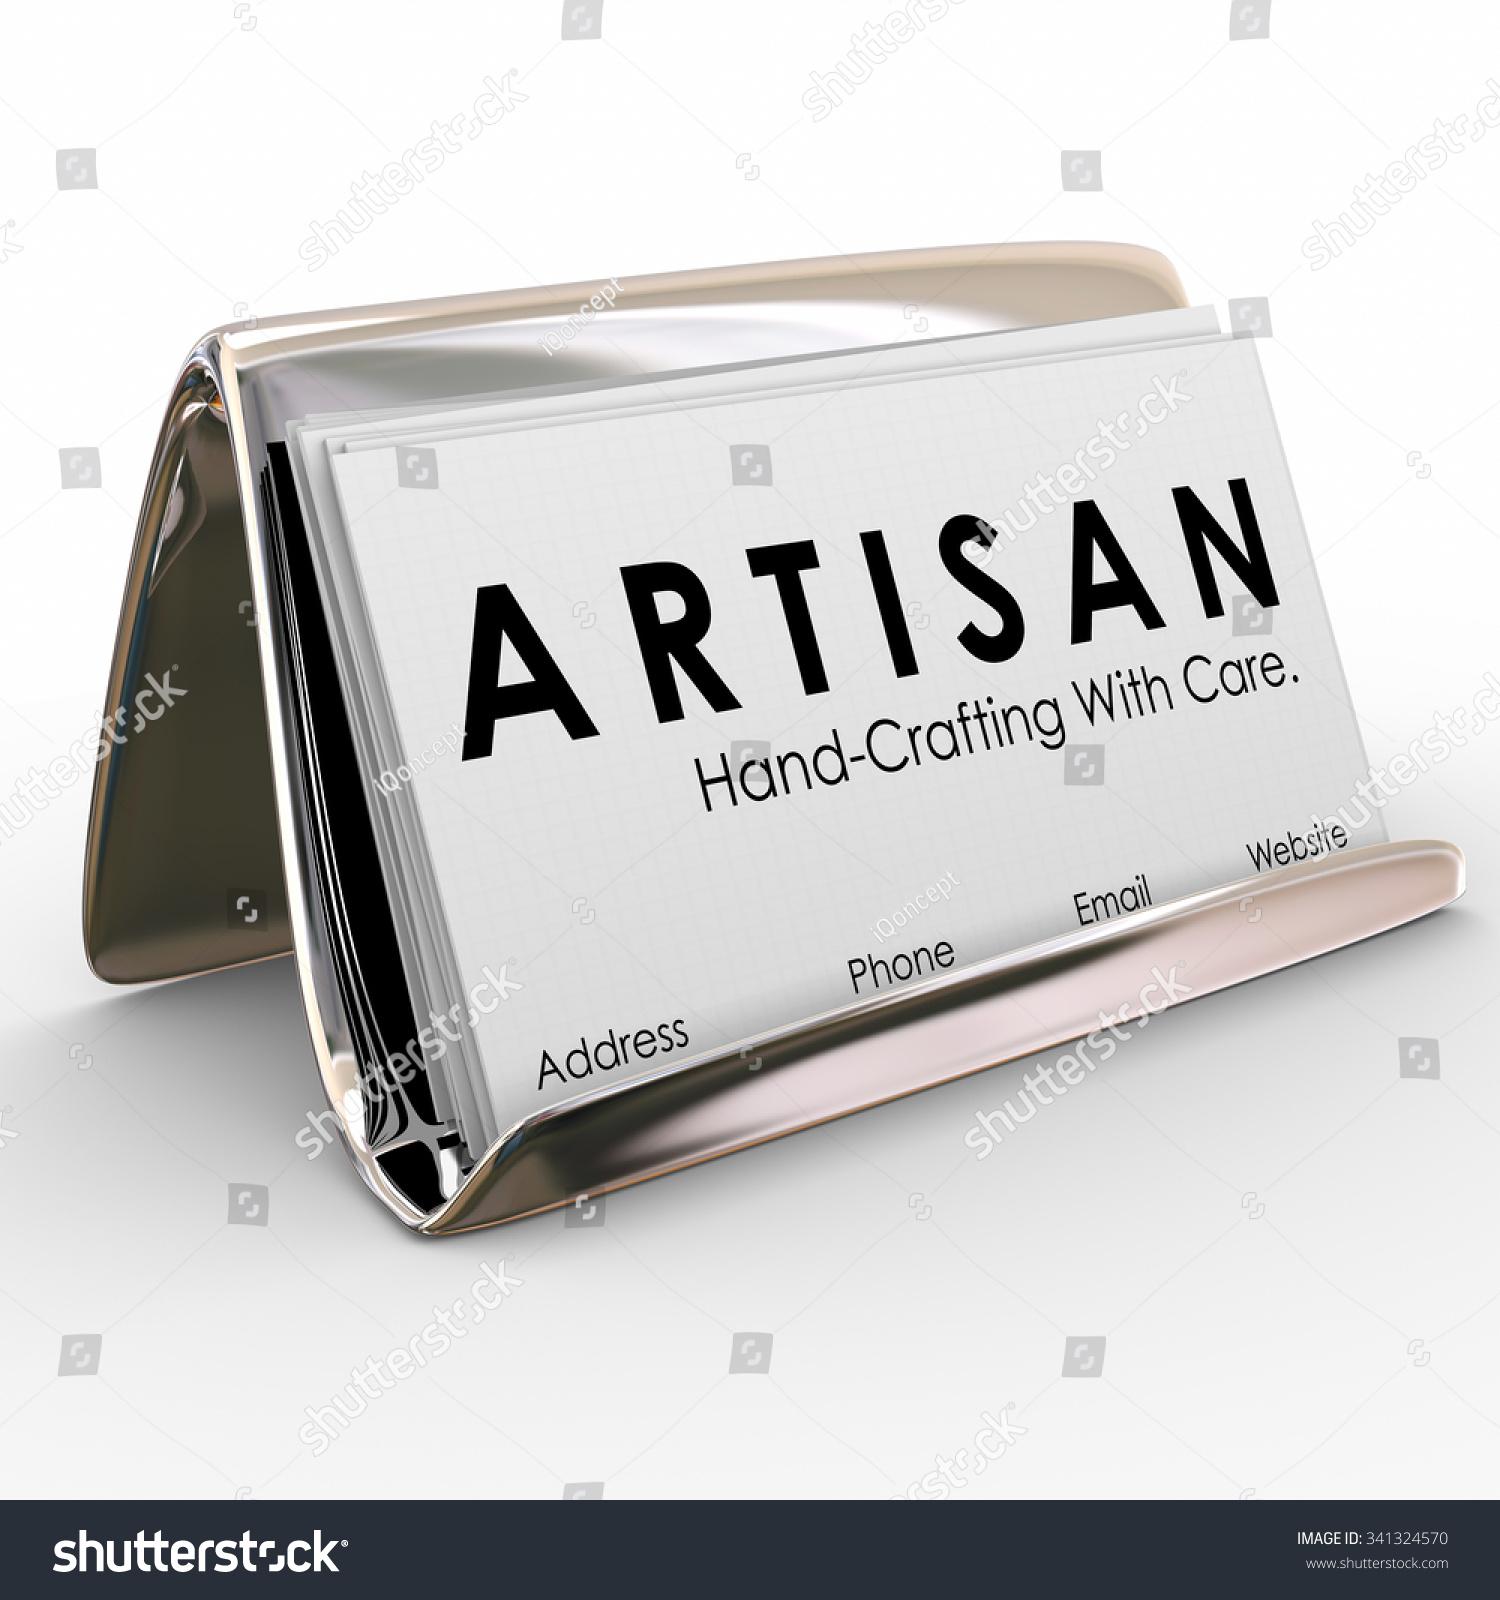 artisan word on business cards holder stock illustration